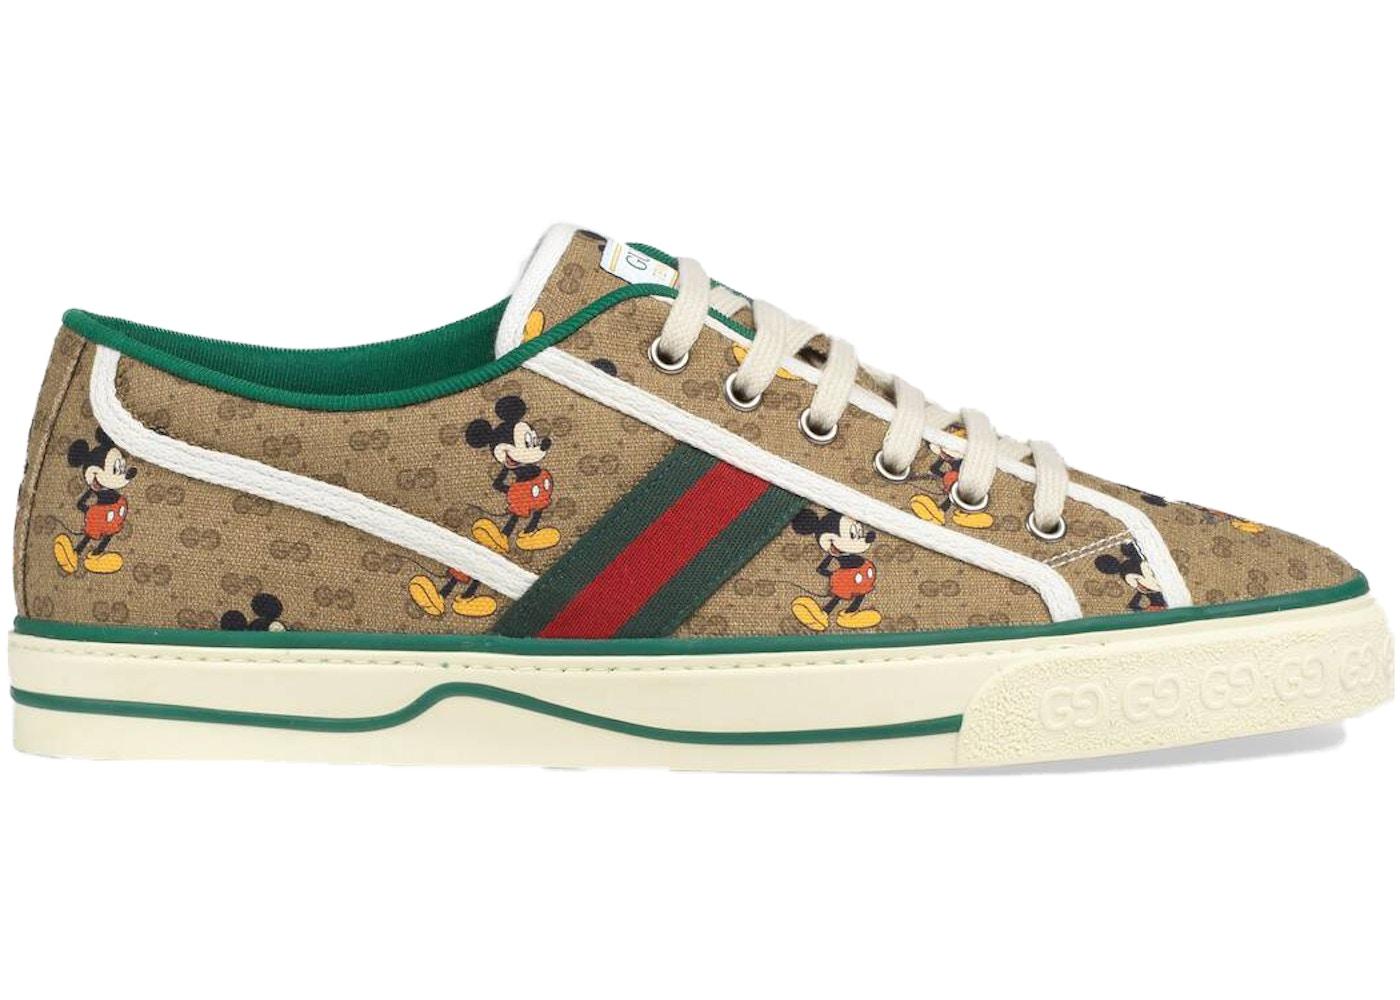 Gucci Tennis 1977 x Disney